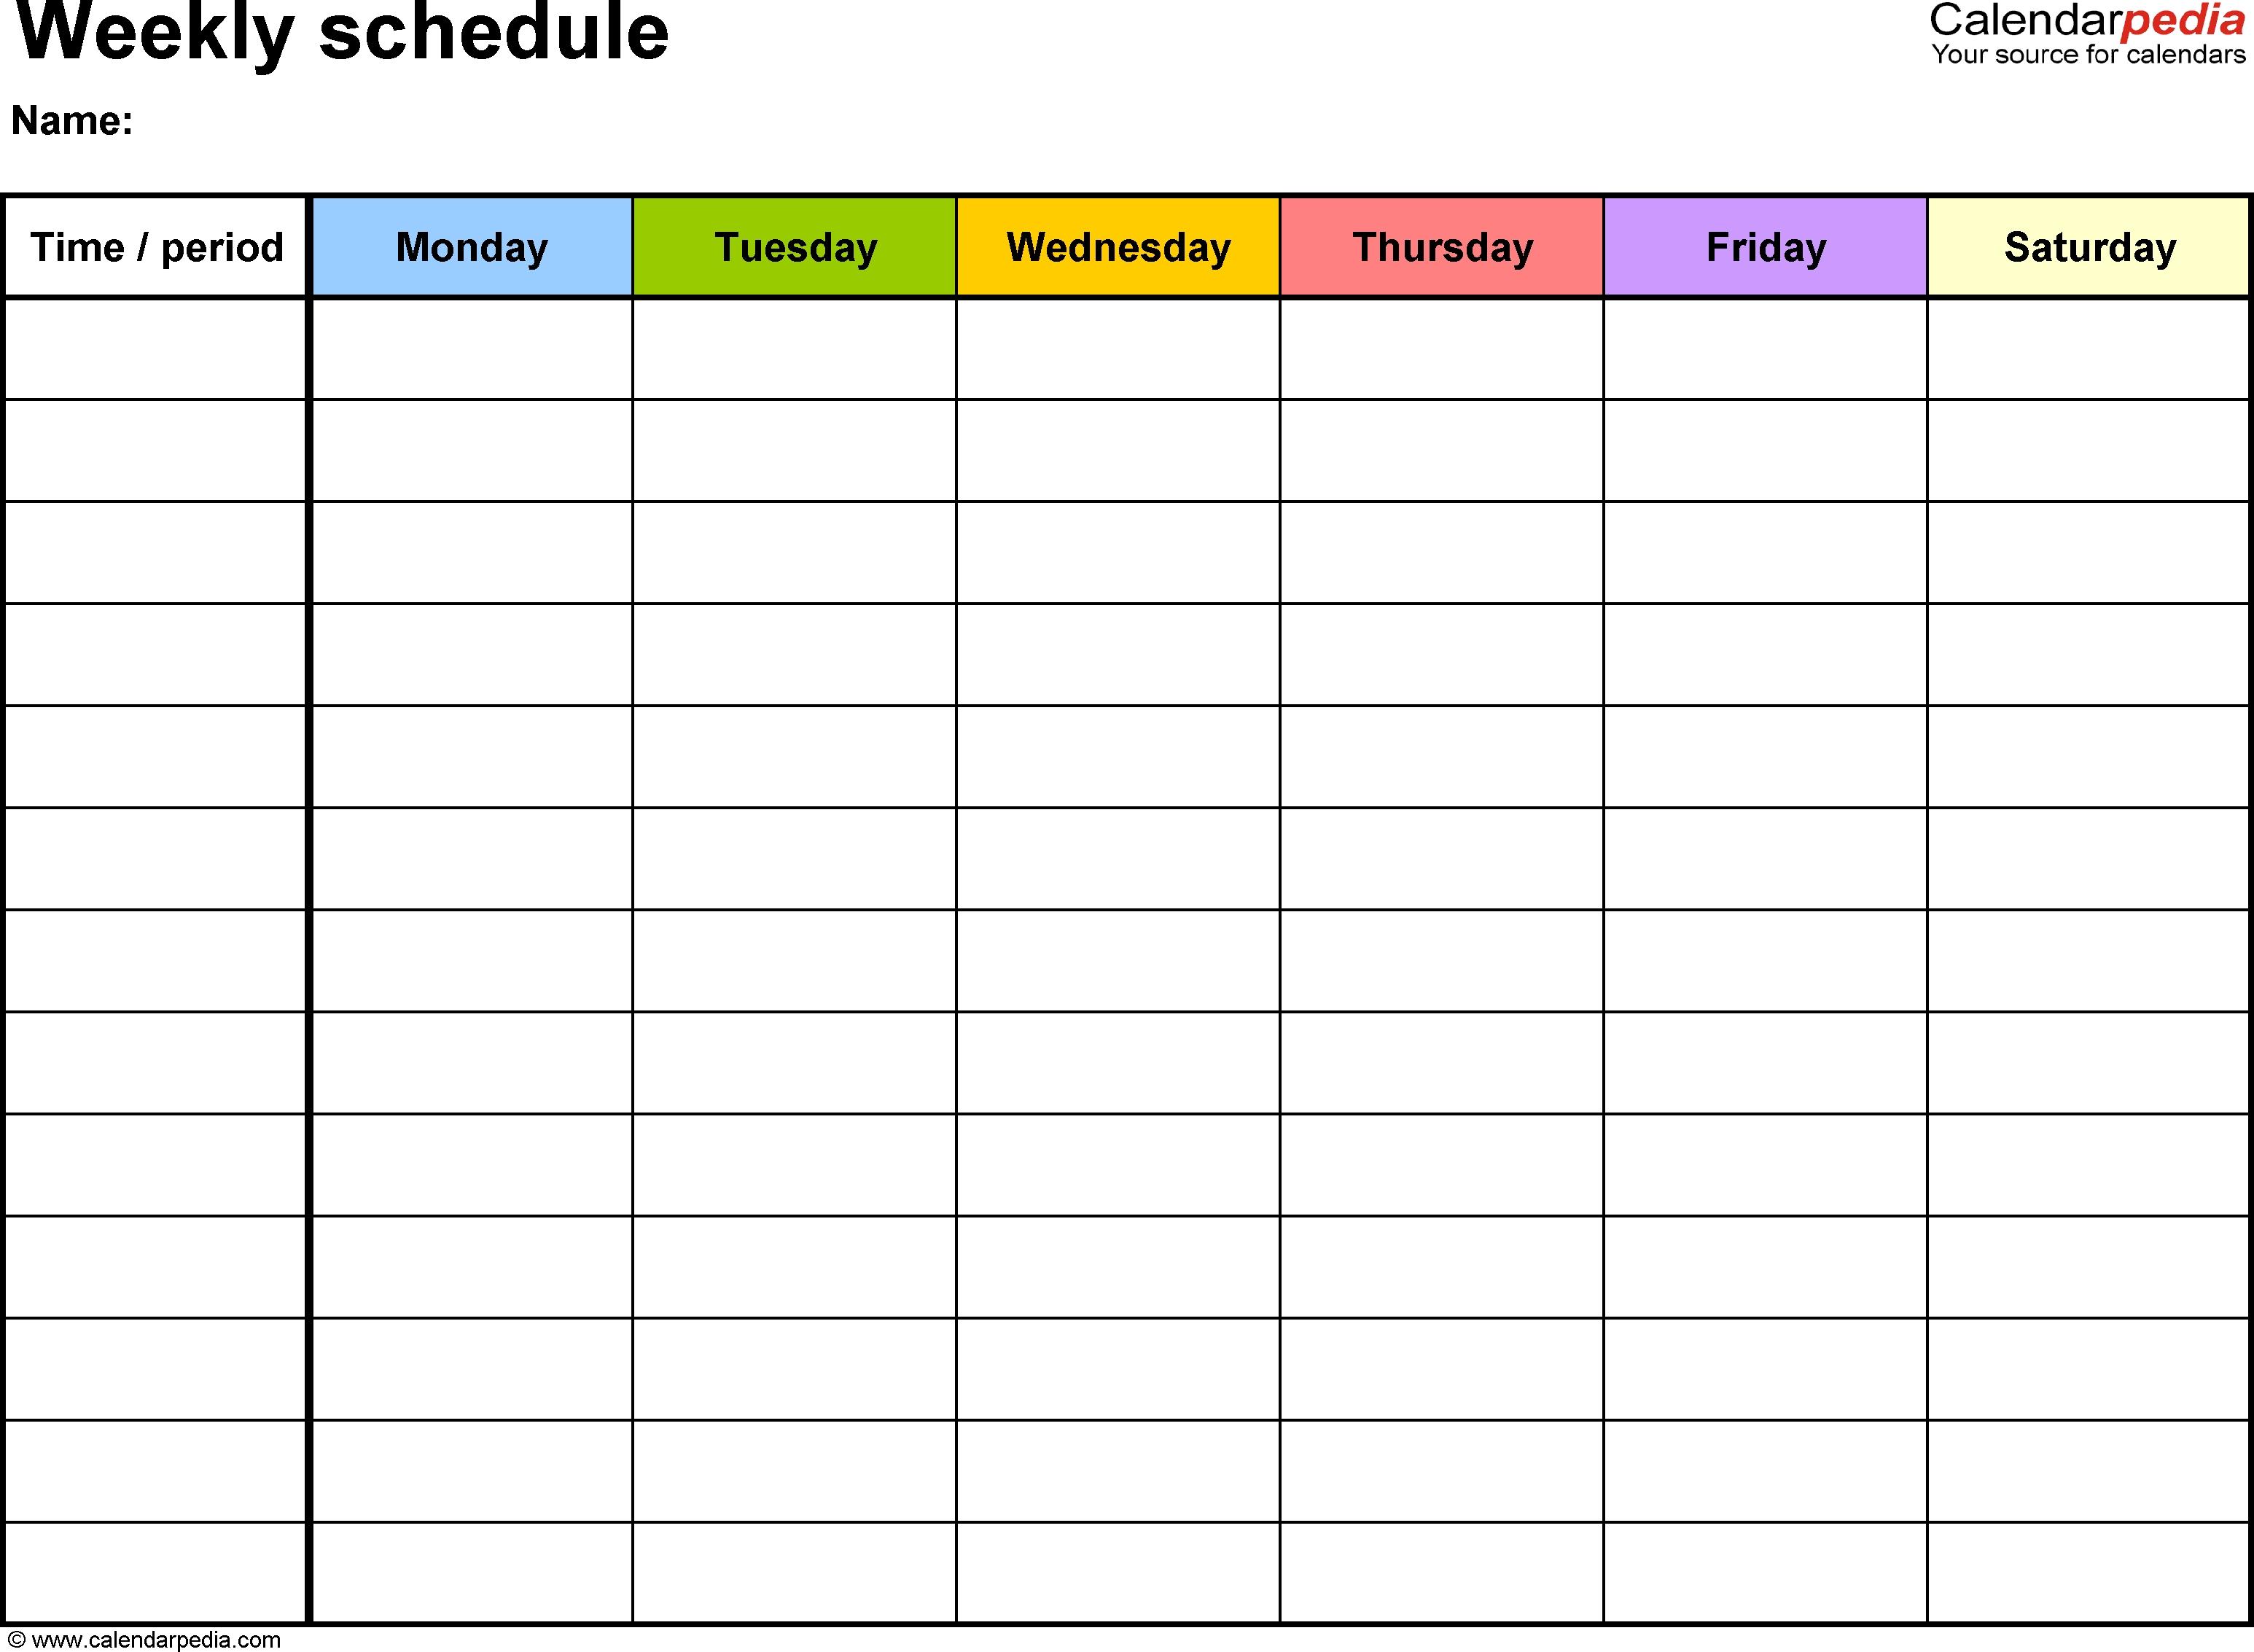 Weekly Calendar Template Word 2017 Calendar With Holidays  Xjb